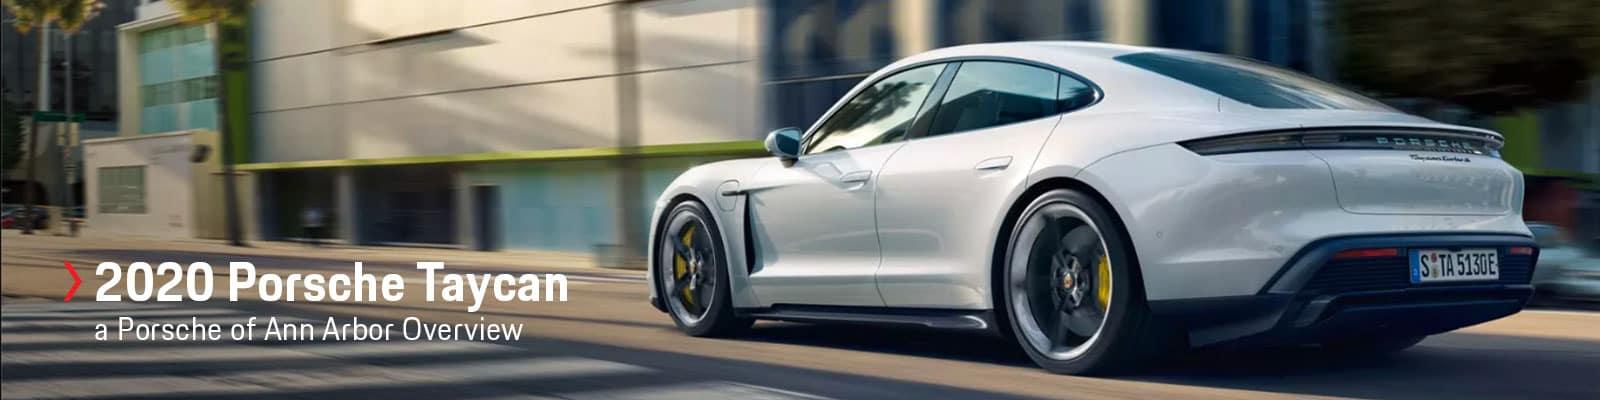 2020 Porsche Taycan Model Overview at Porsche of Ann Arbor